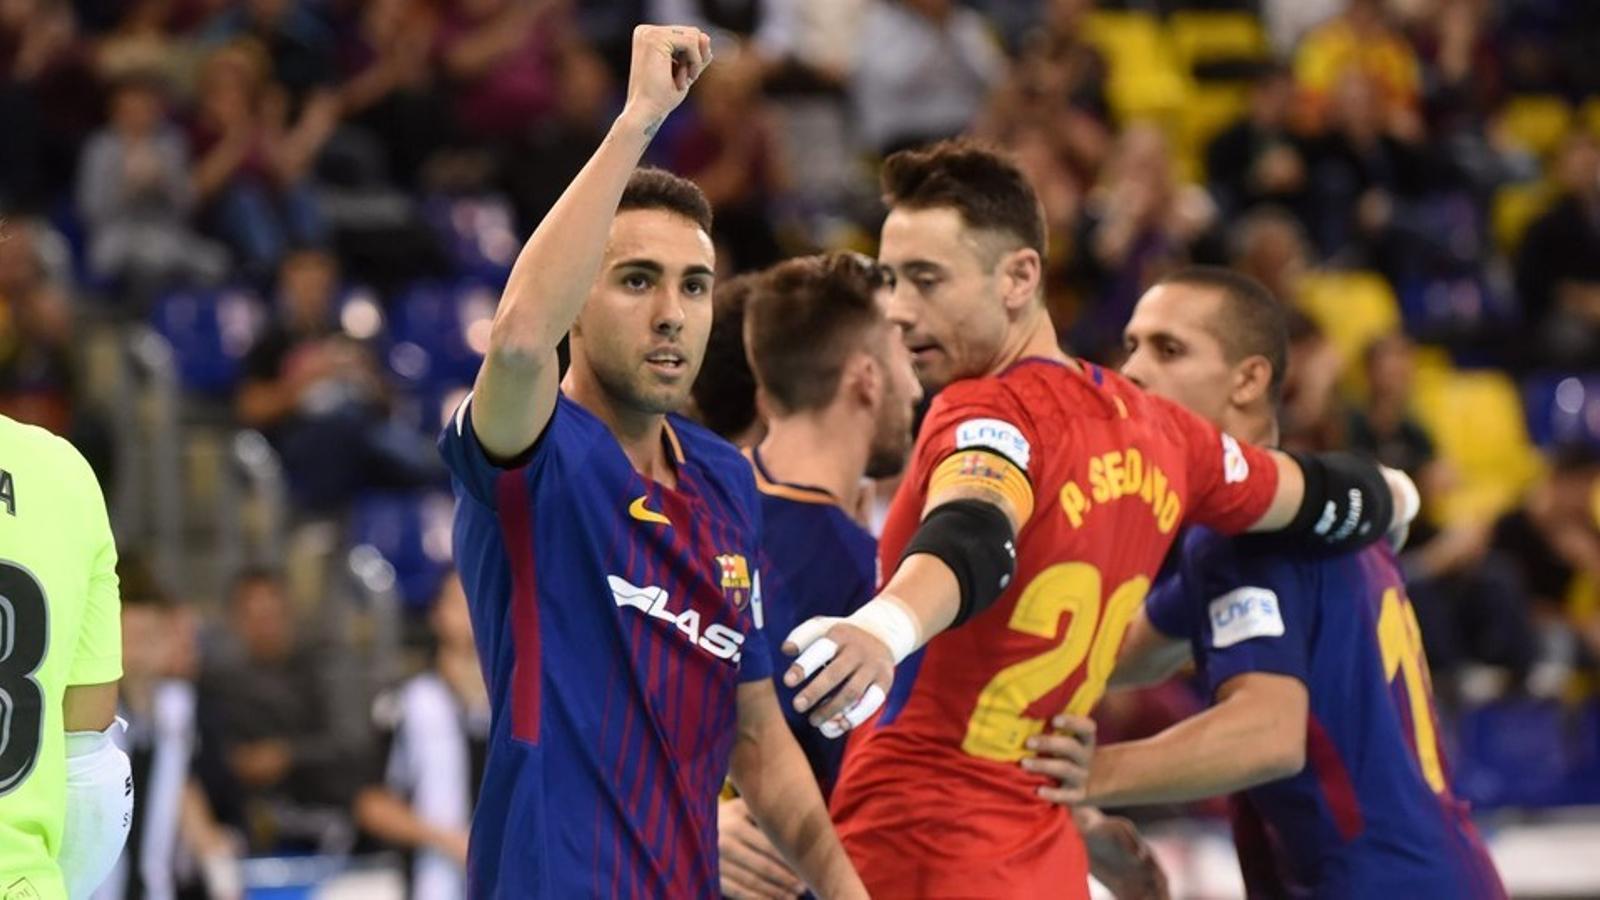 Aicardo celebra el primer gol del partit contra el Llevant